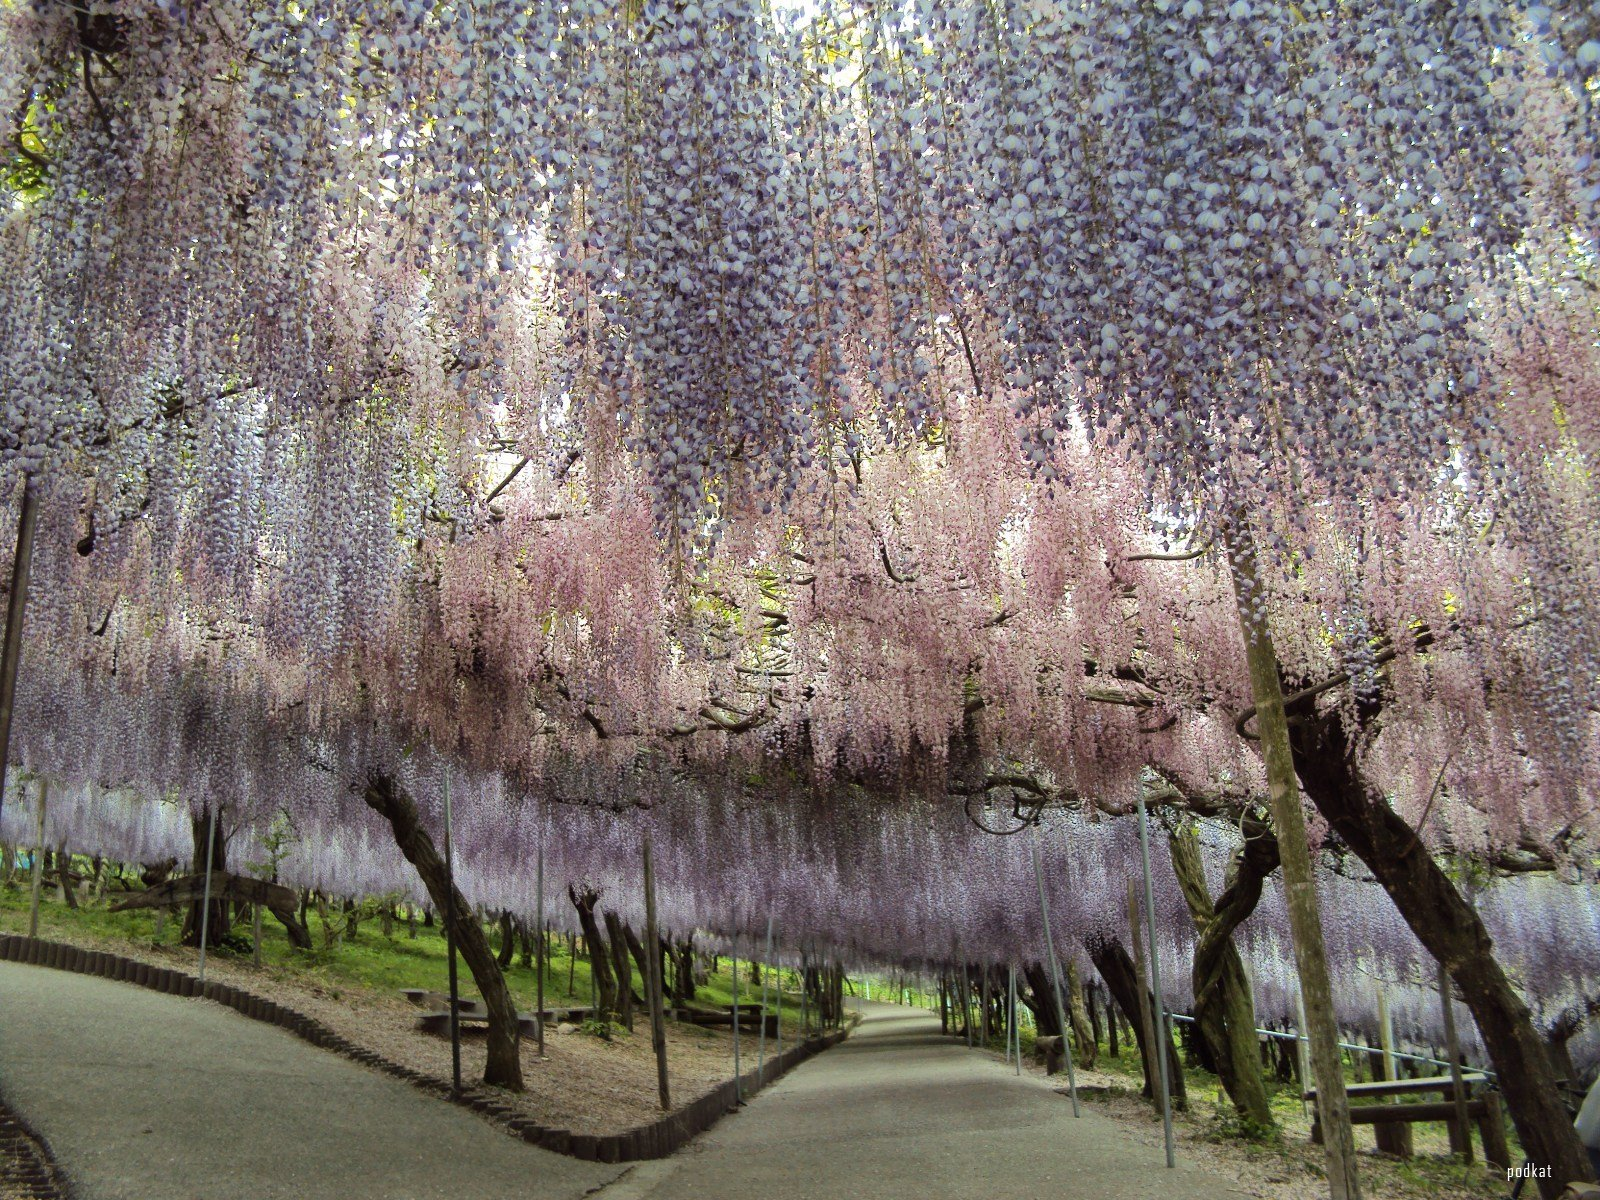 Wisteria Tunnel - Kawachi Fuji Gardens, in Kitakyushu, Japan: www.eclectitude.com/2012/04/wisteria-tunnel-kawachi-fuji-gardens.html